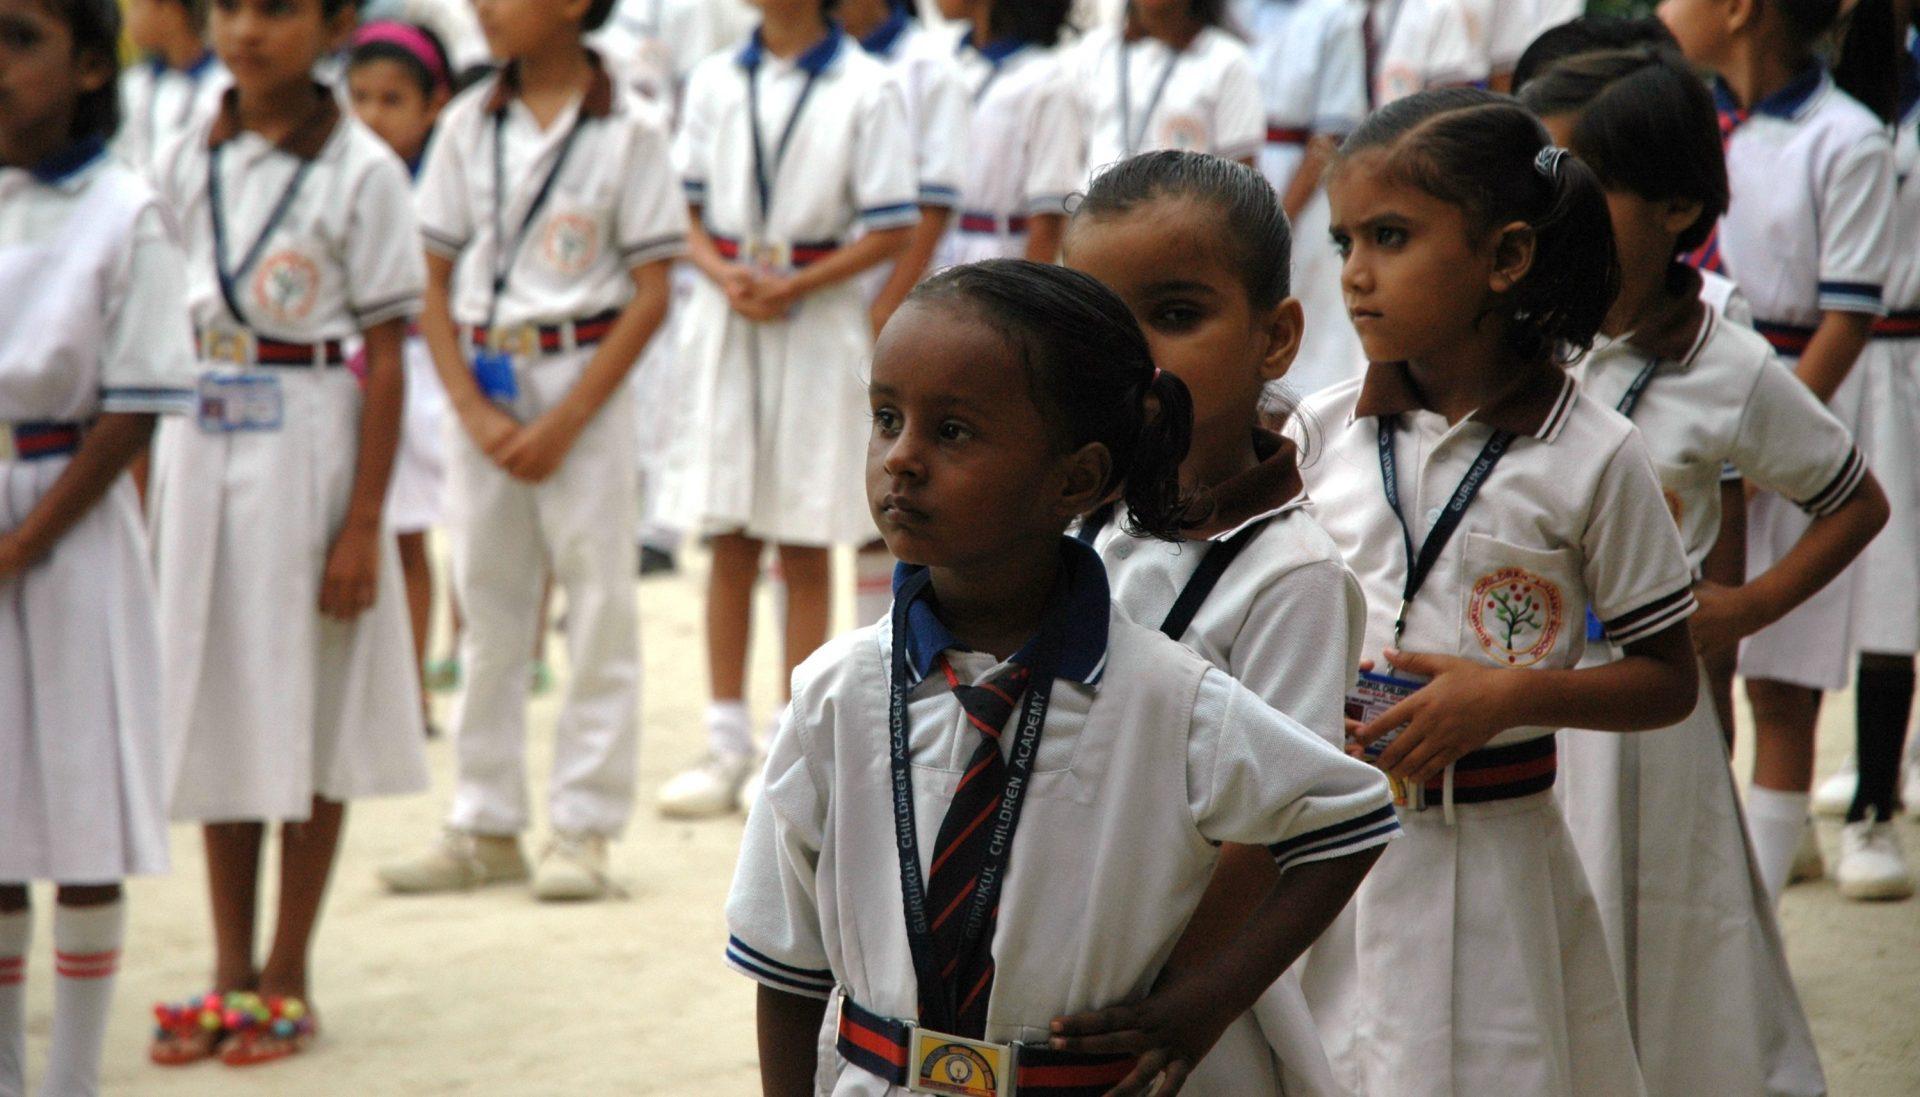 Meisjes op de Gurukul Kinder school staan s'ochtends in de rij.